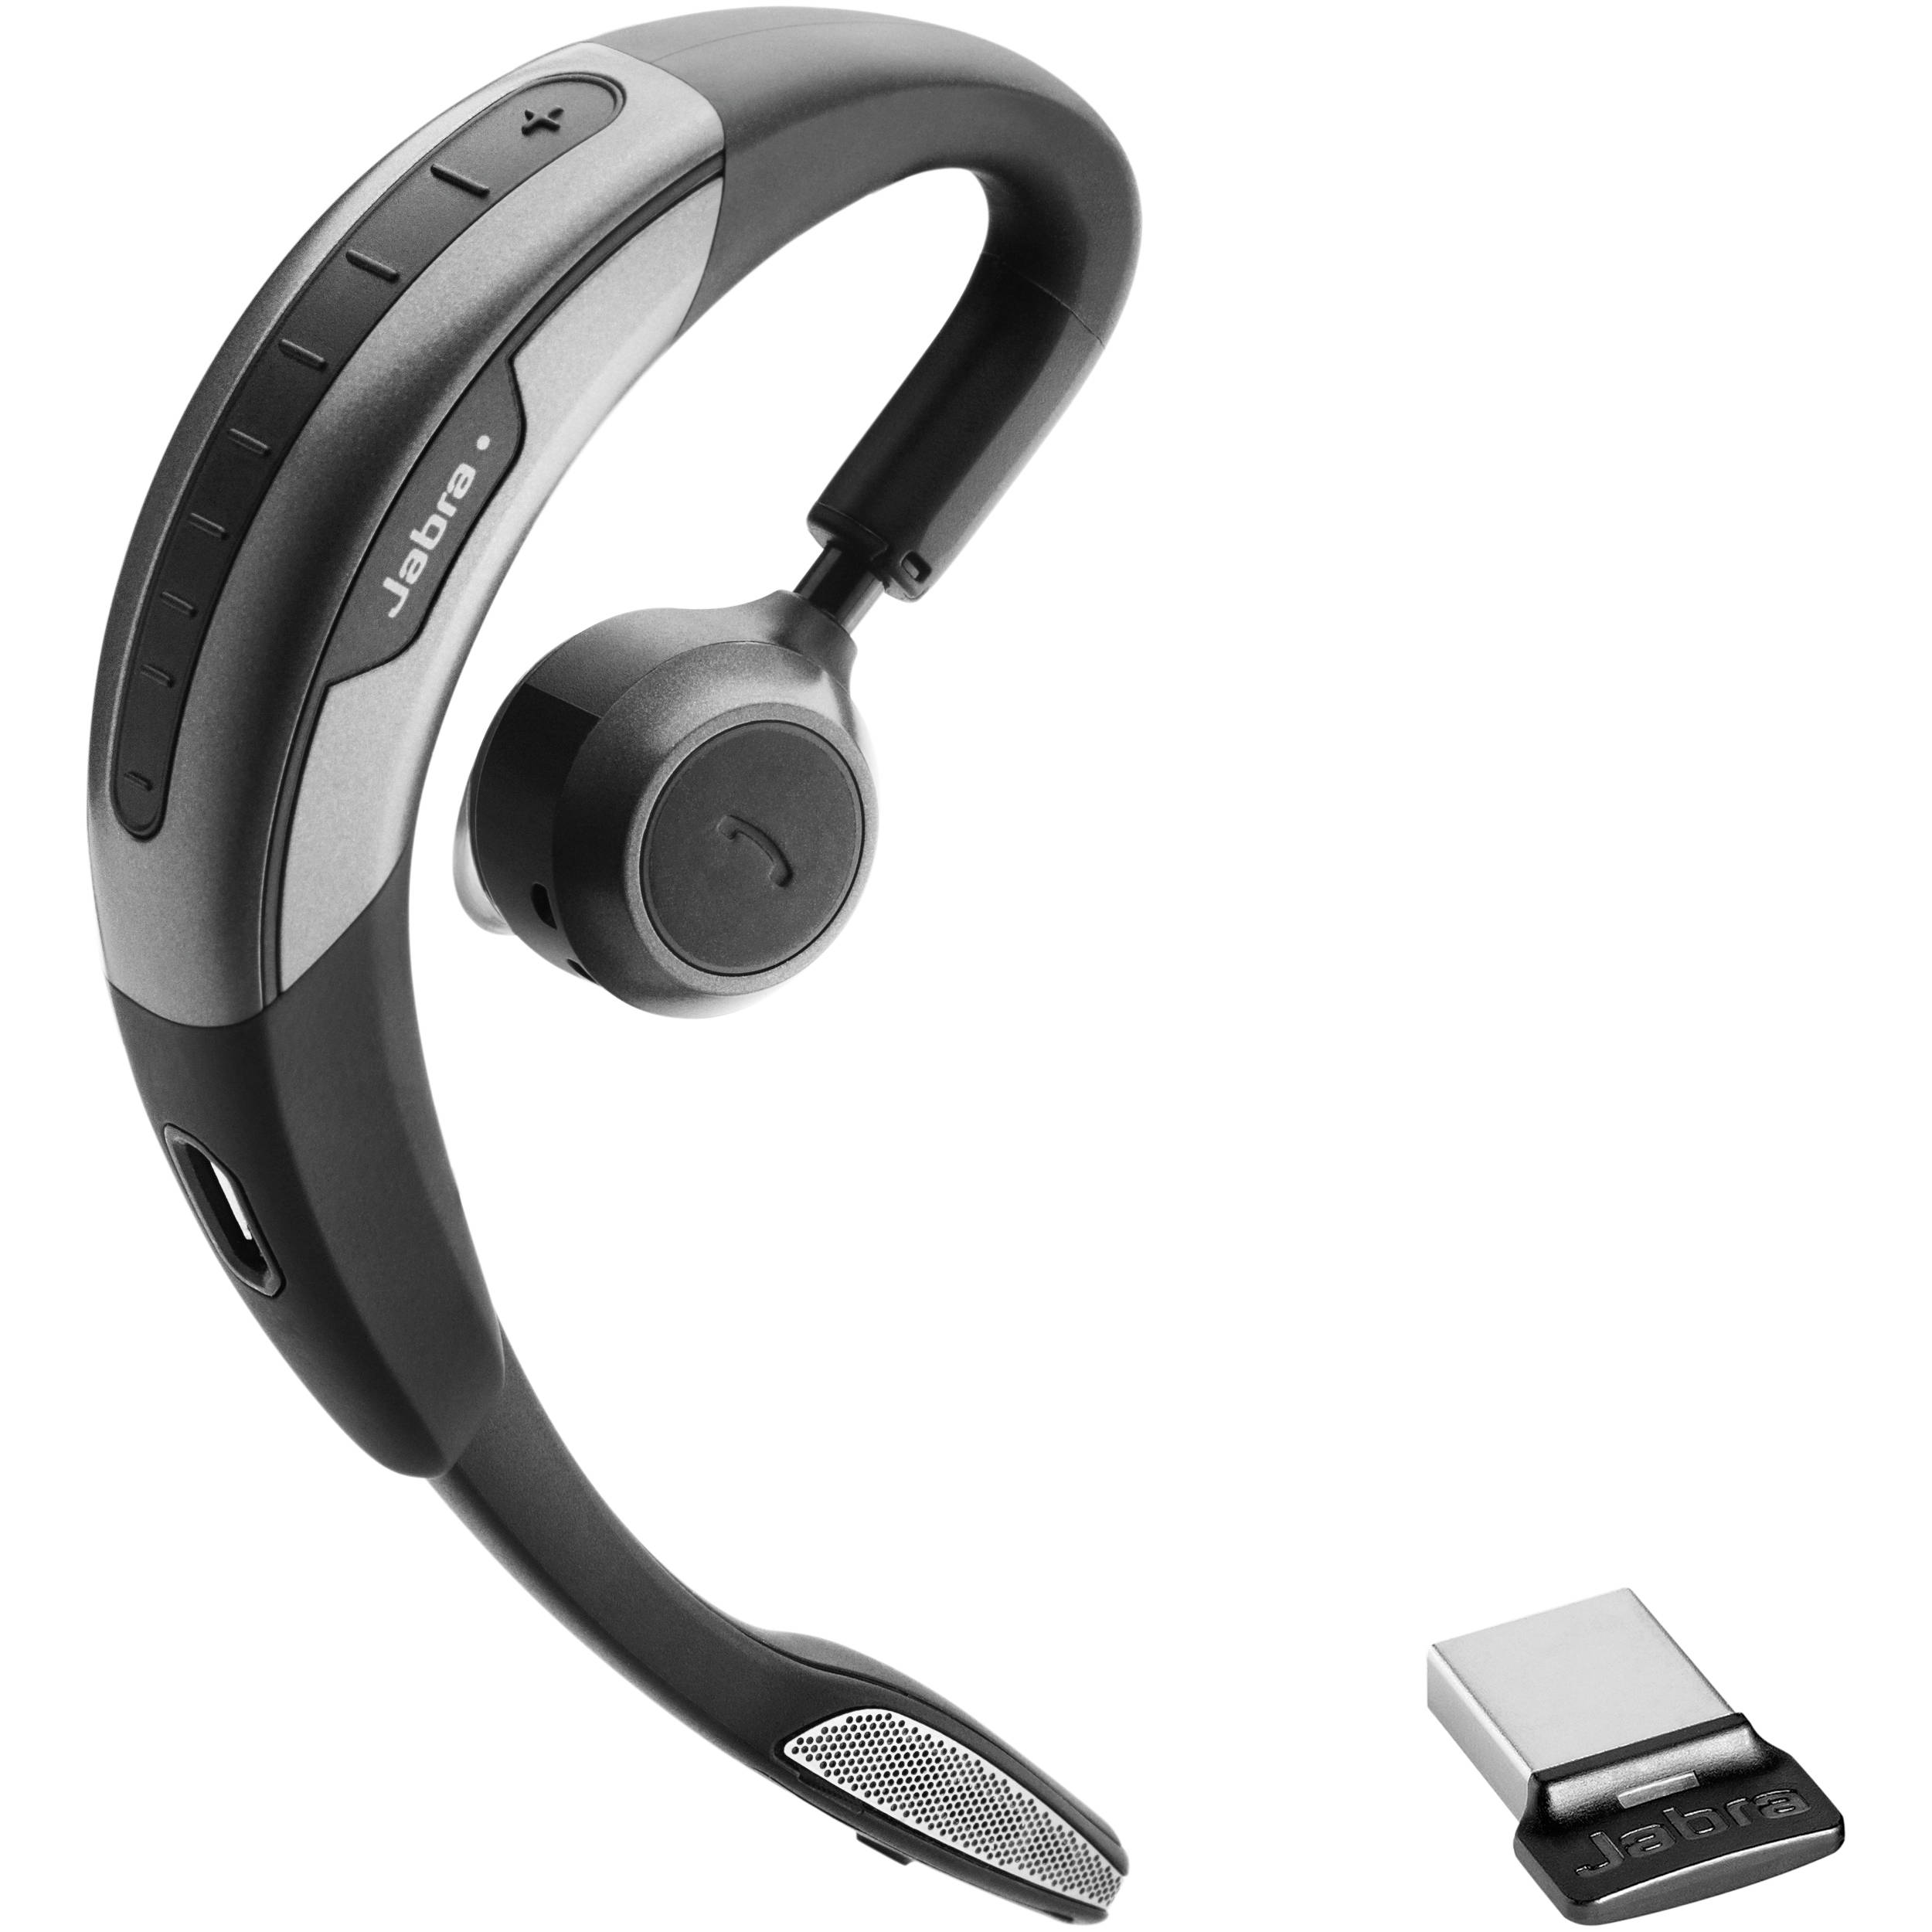 jabra wave handsfree headset manual